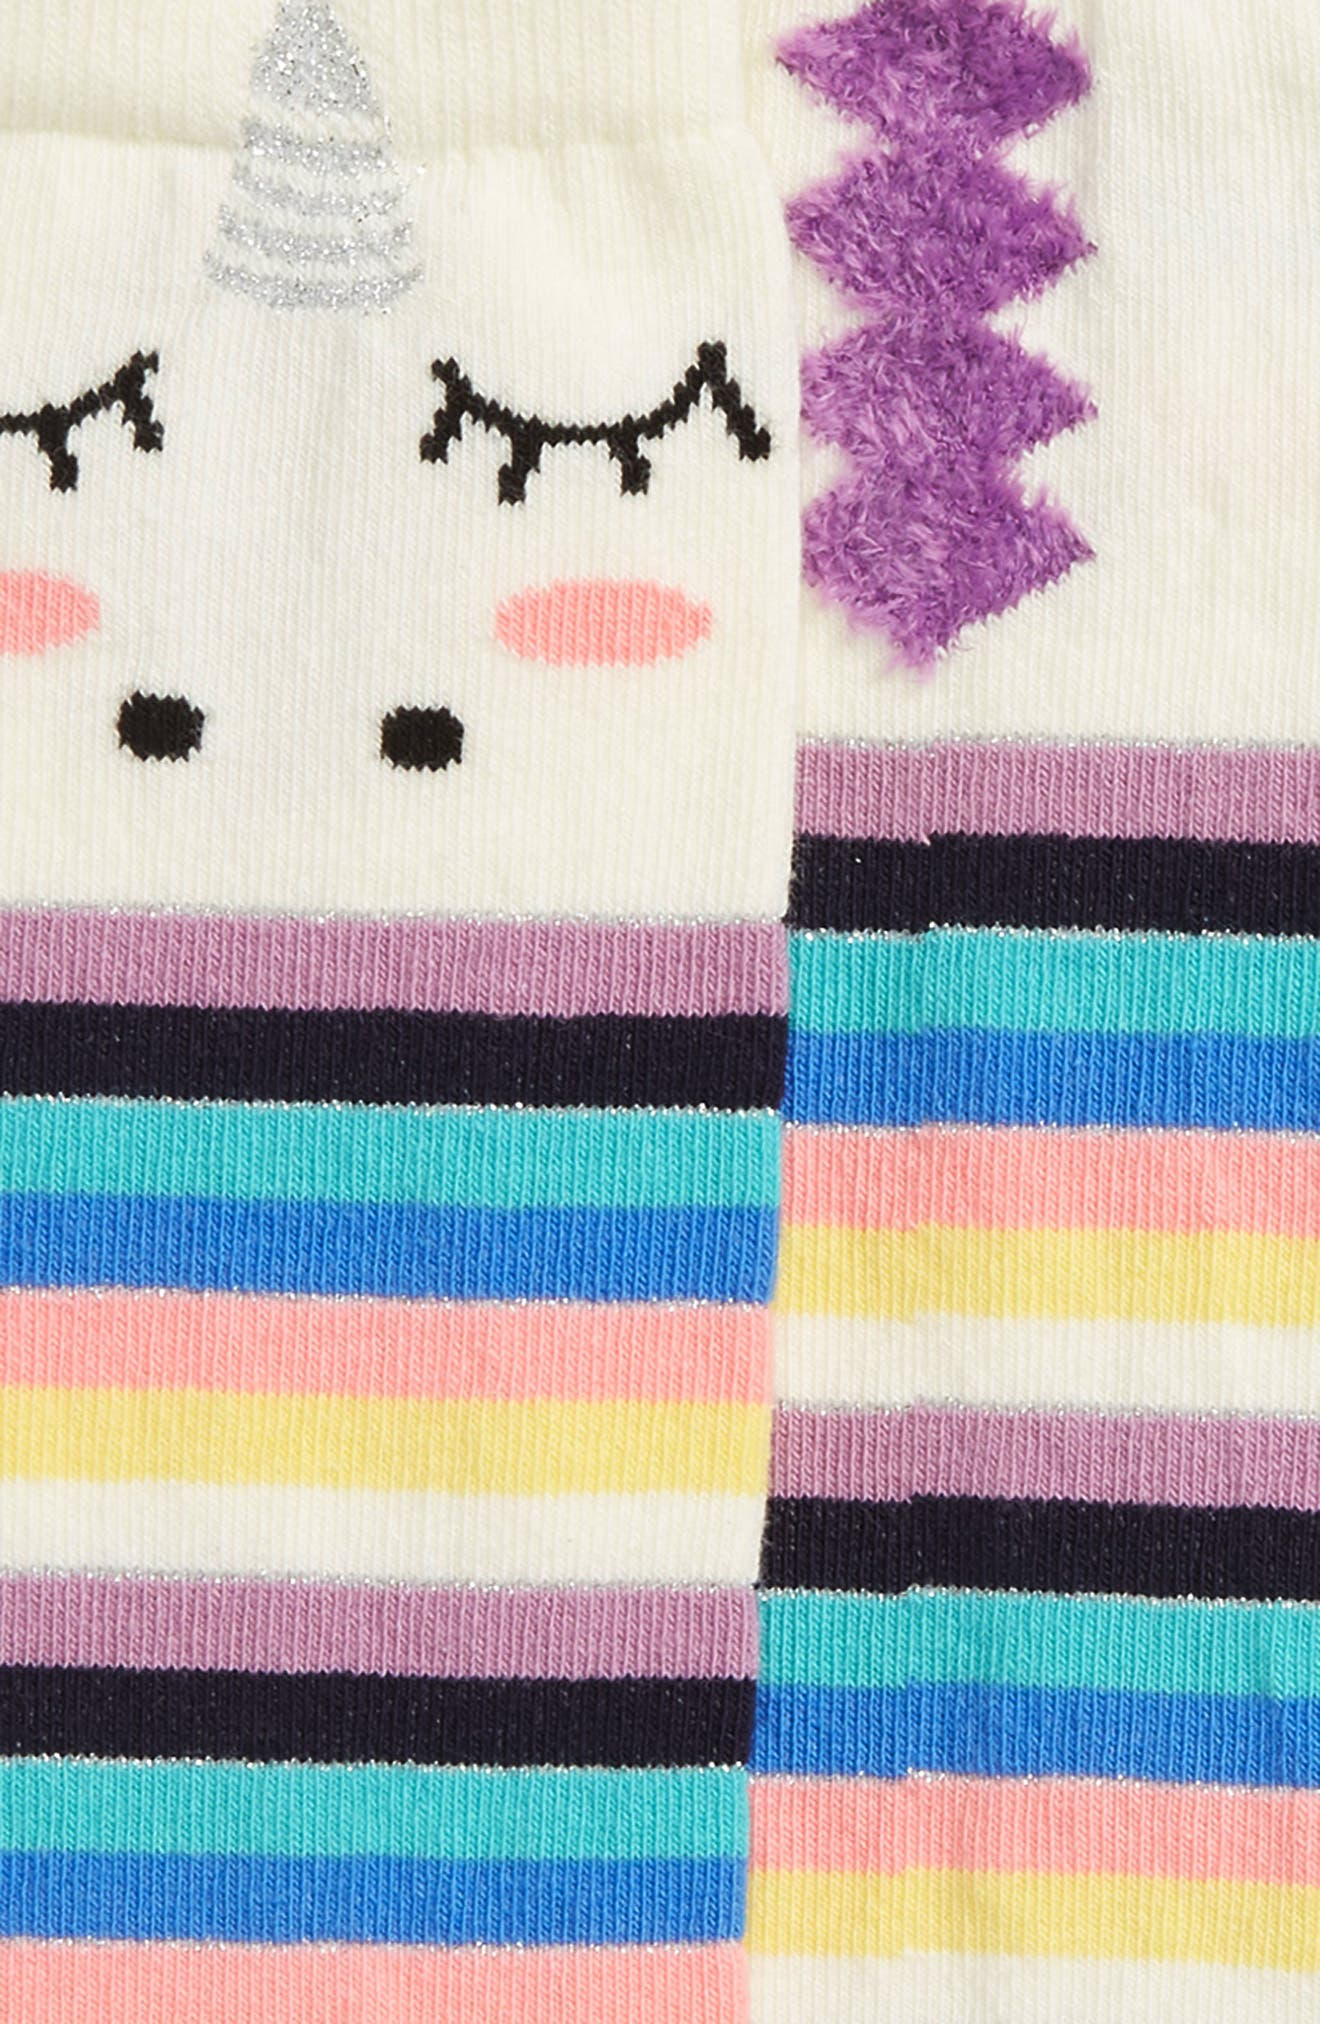 2-Pack of Rainbows & Unicorns Knee High Socks,                             Alternate thumbnail 2, color,                             101